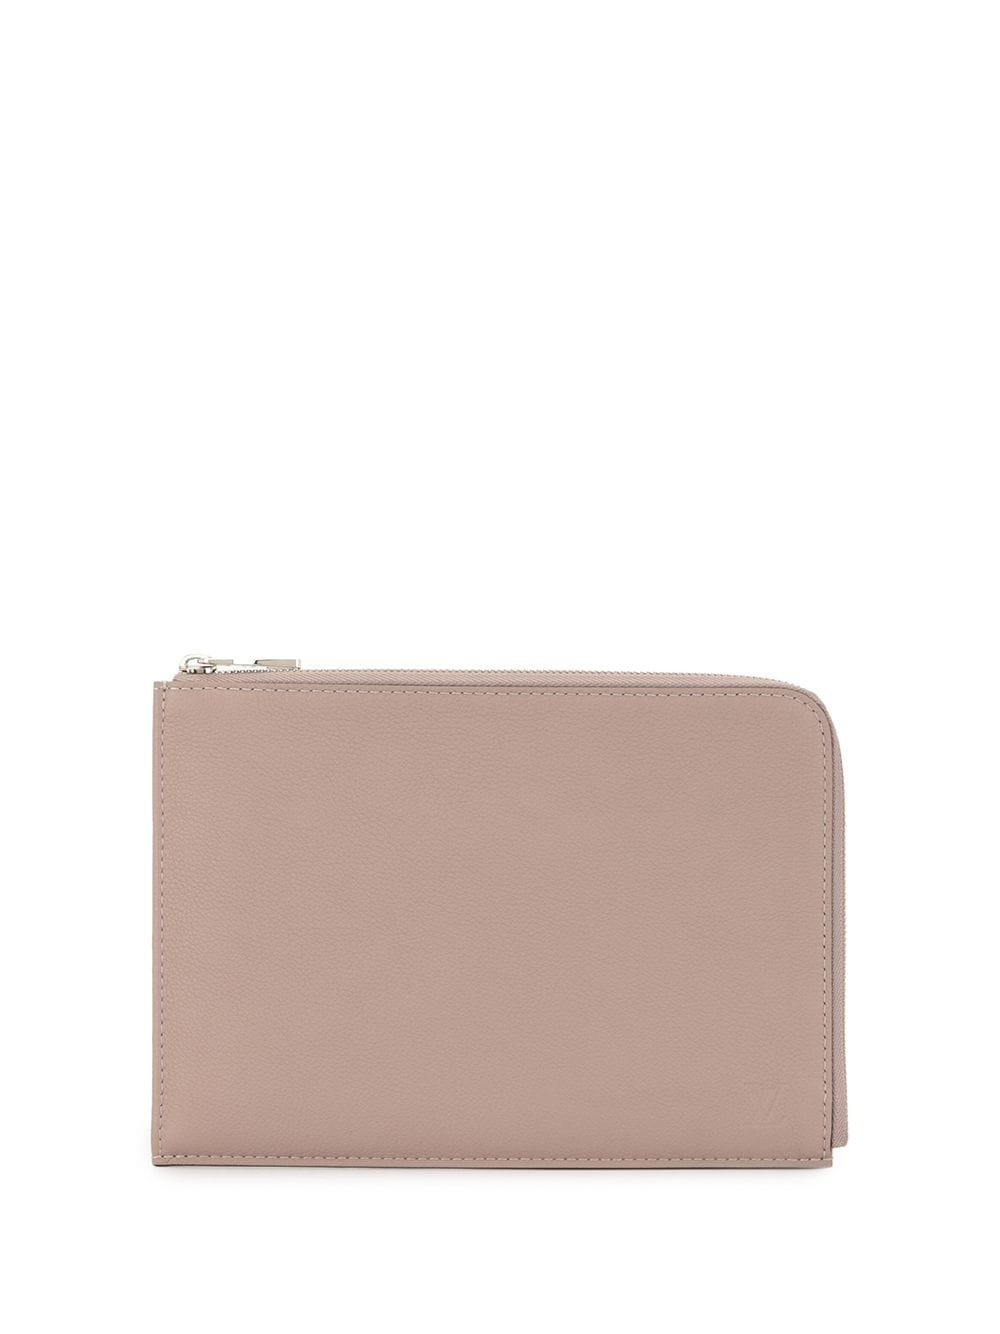 Louis Vuitton 2017 pre-owned Pochette Jules PM Clutch - Nude